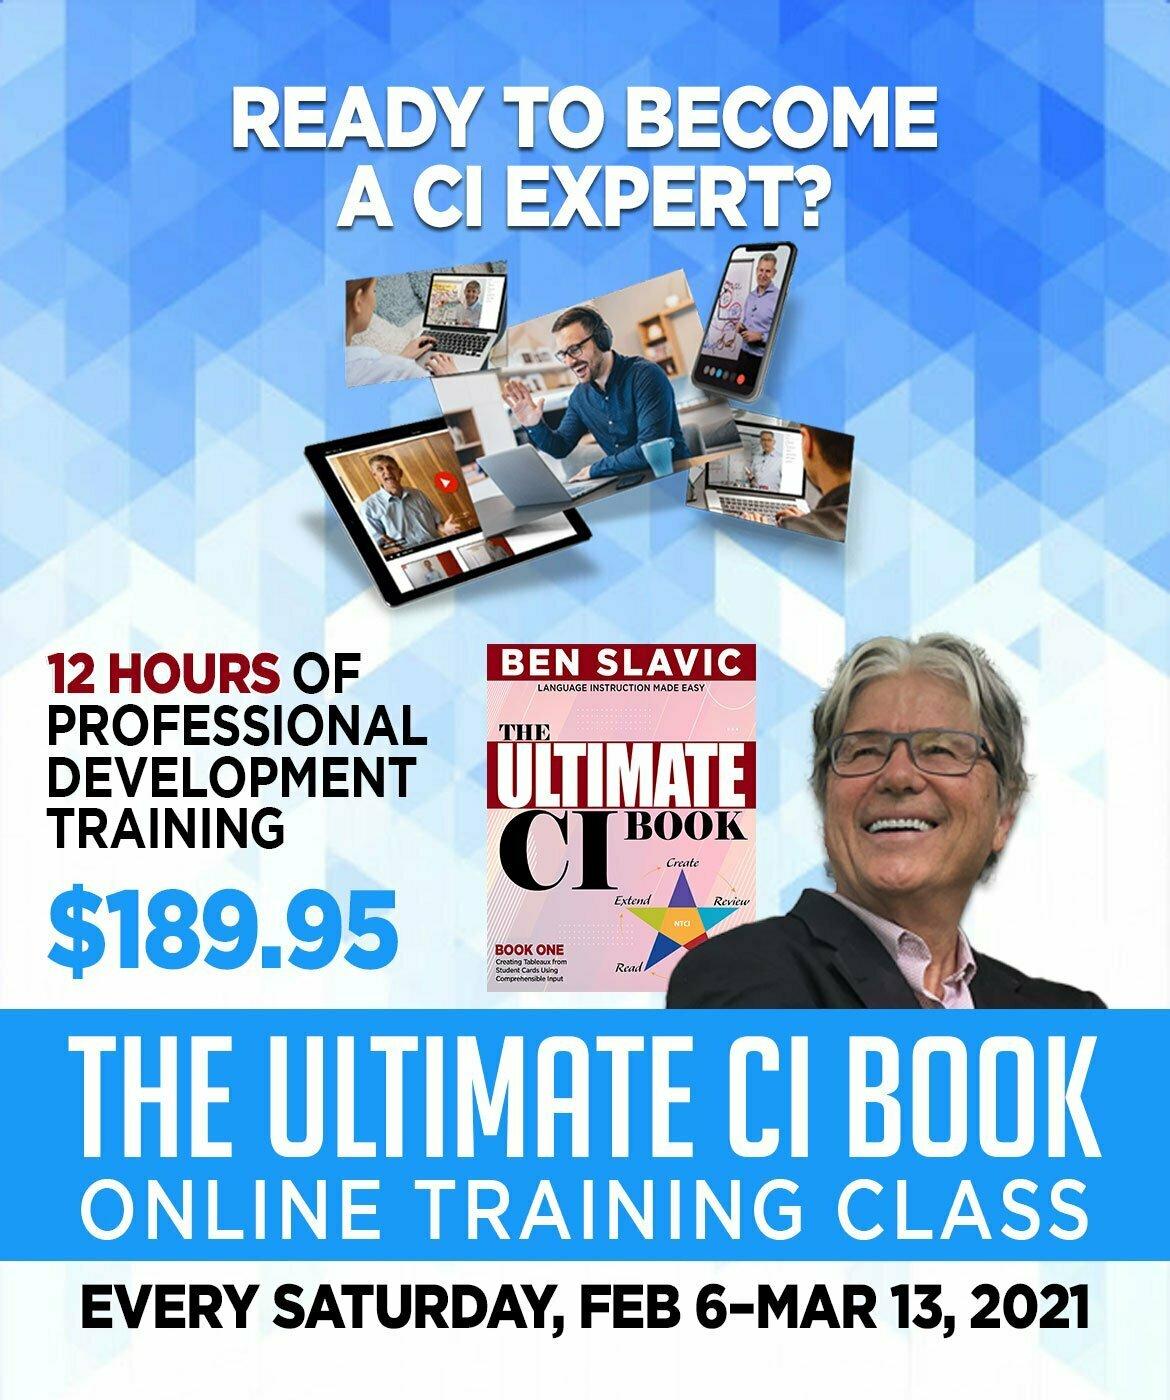 Teacher Professional Development Training